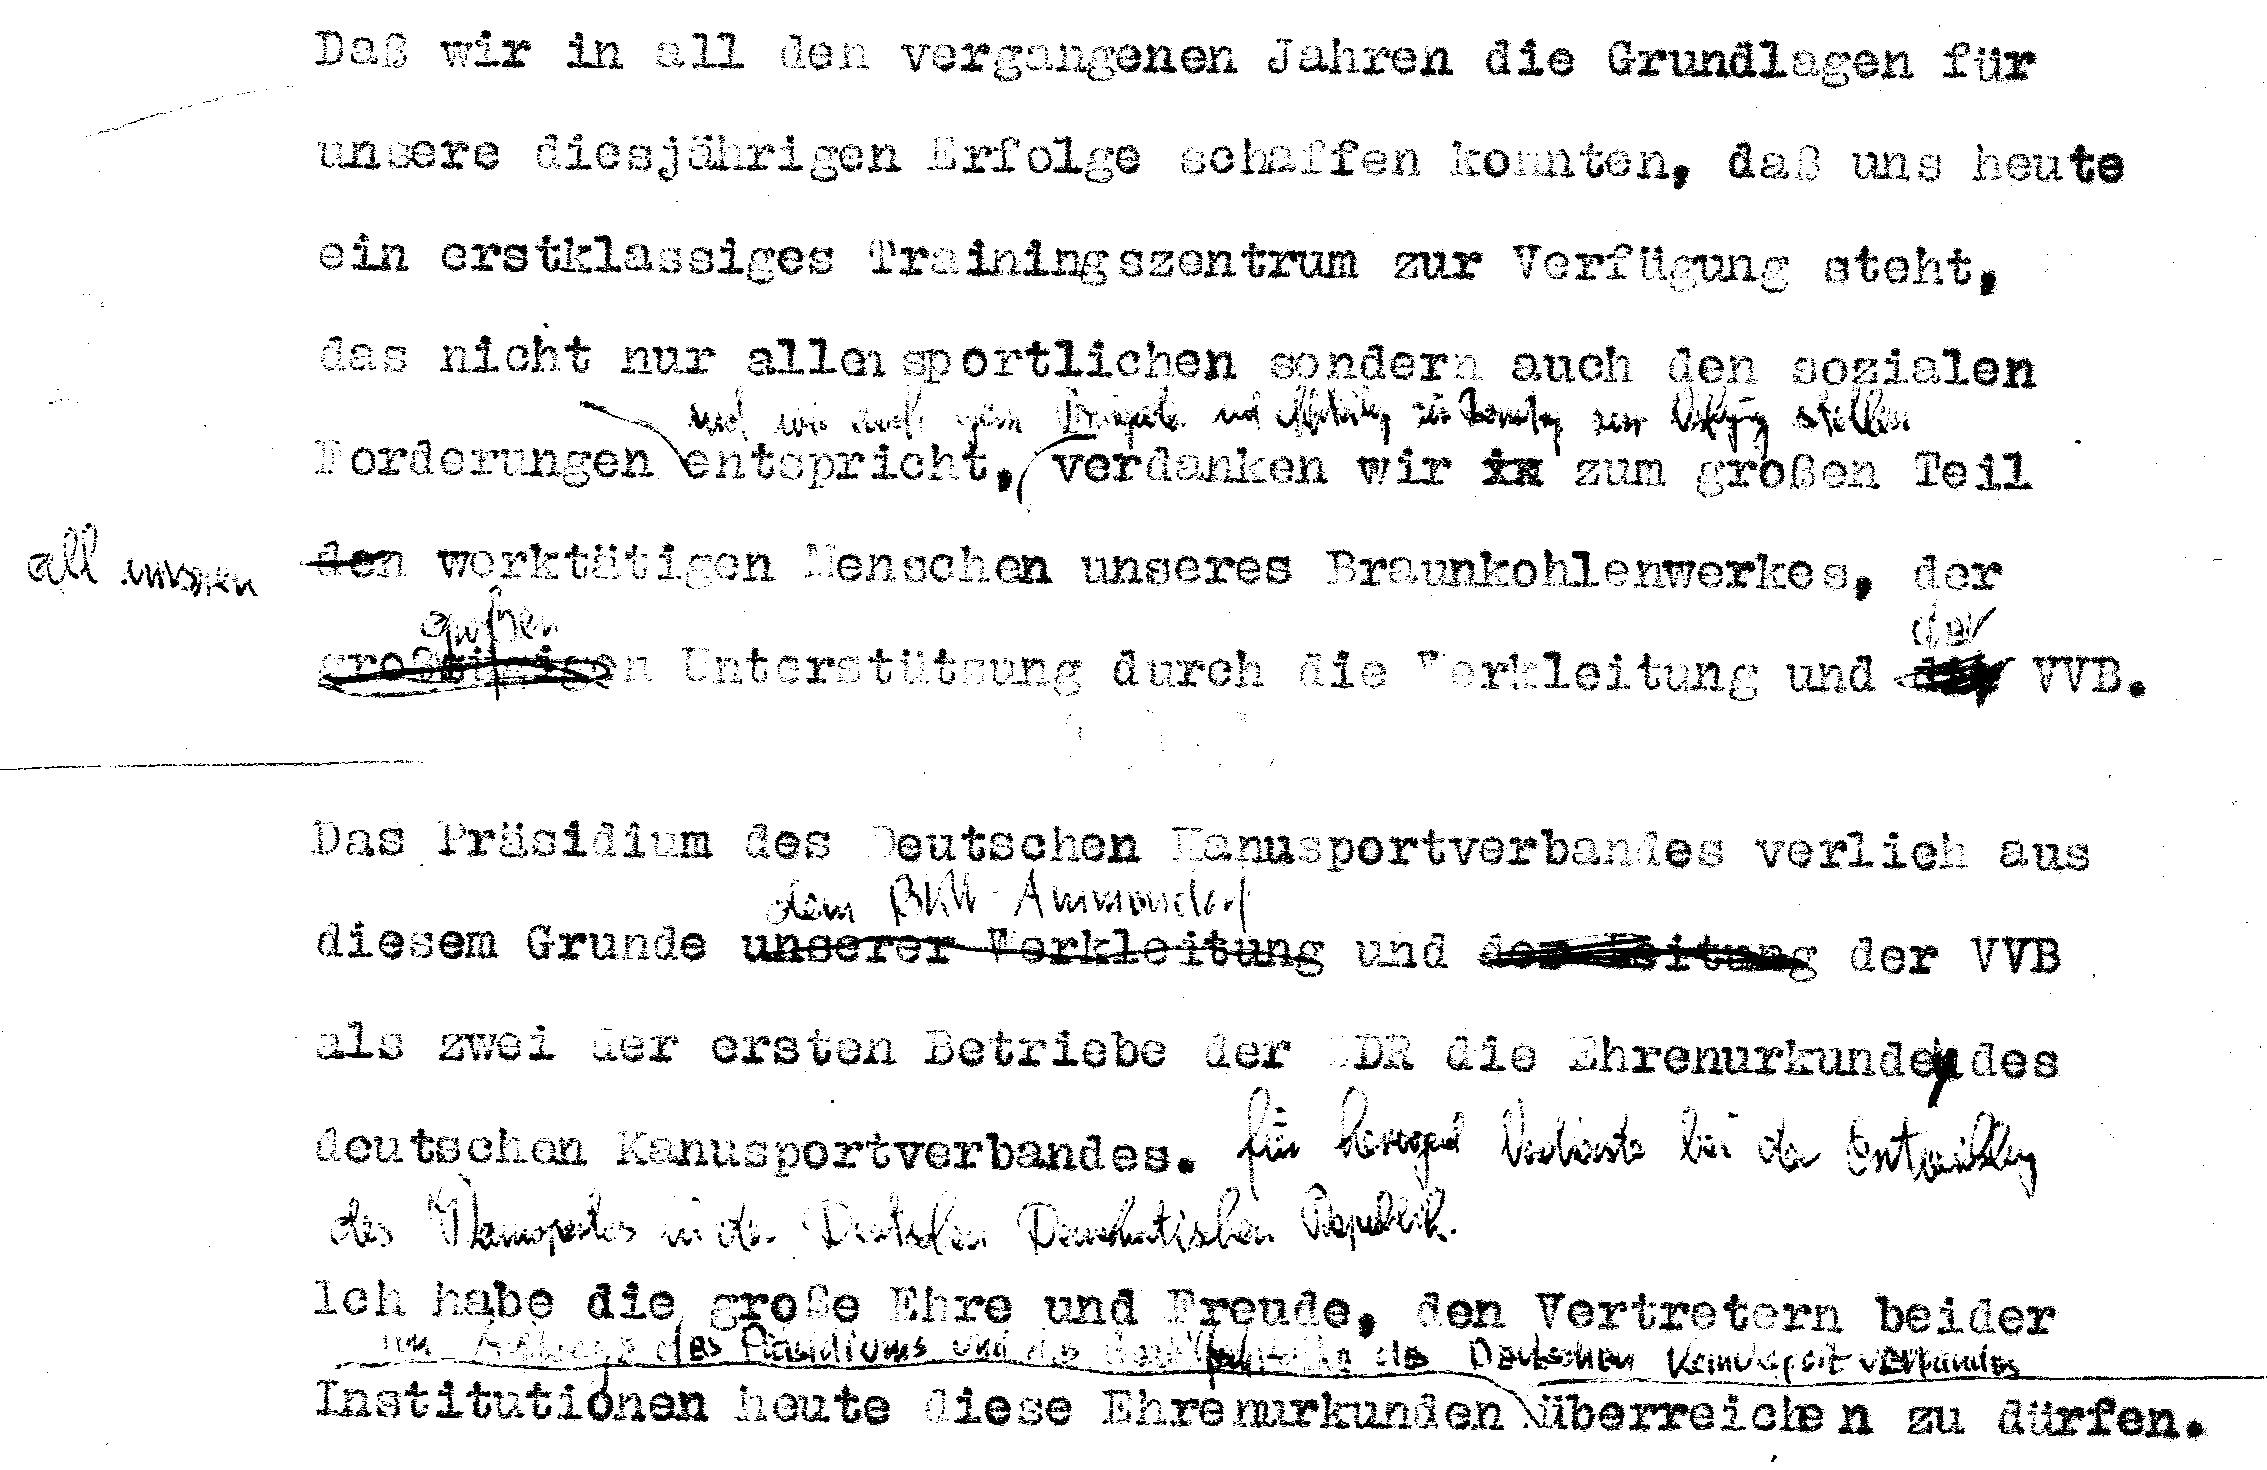 1966 Jahresbericht Erfolge Sektion (5)